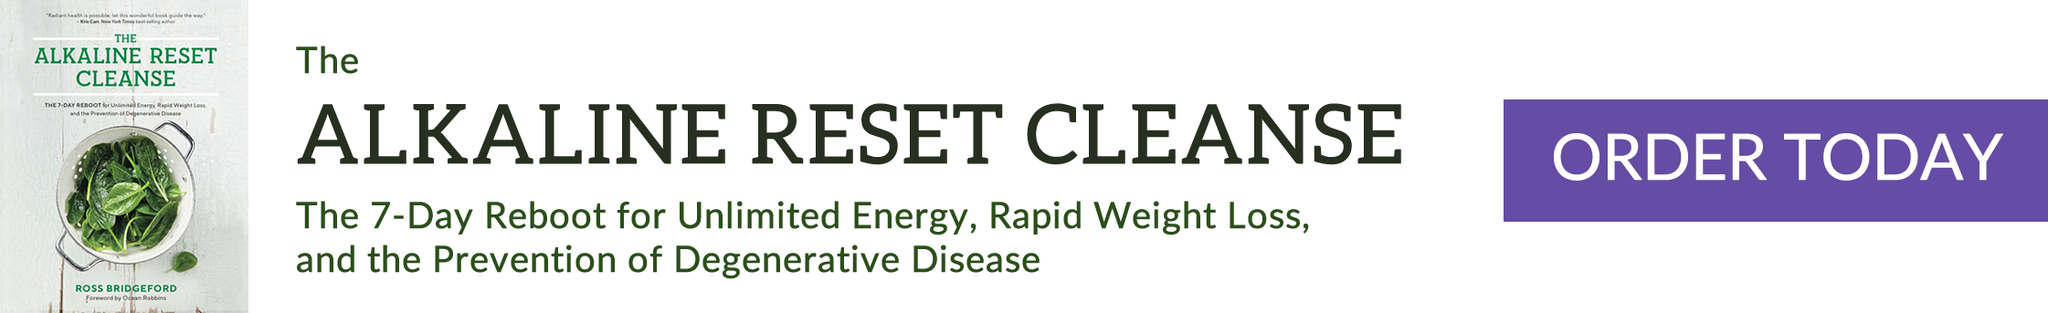 Alkaline Reset Cleanse book banner